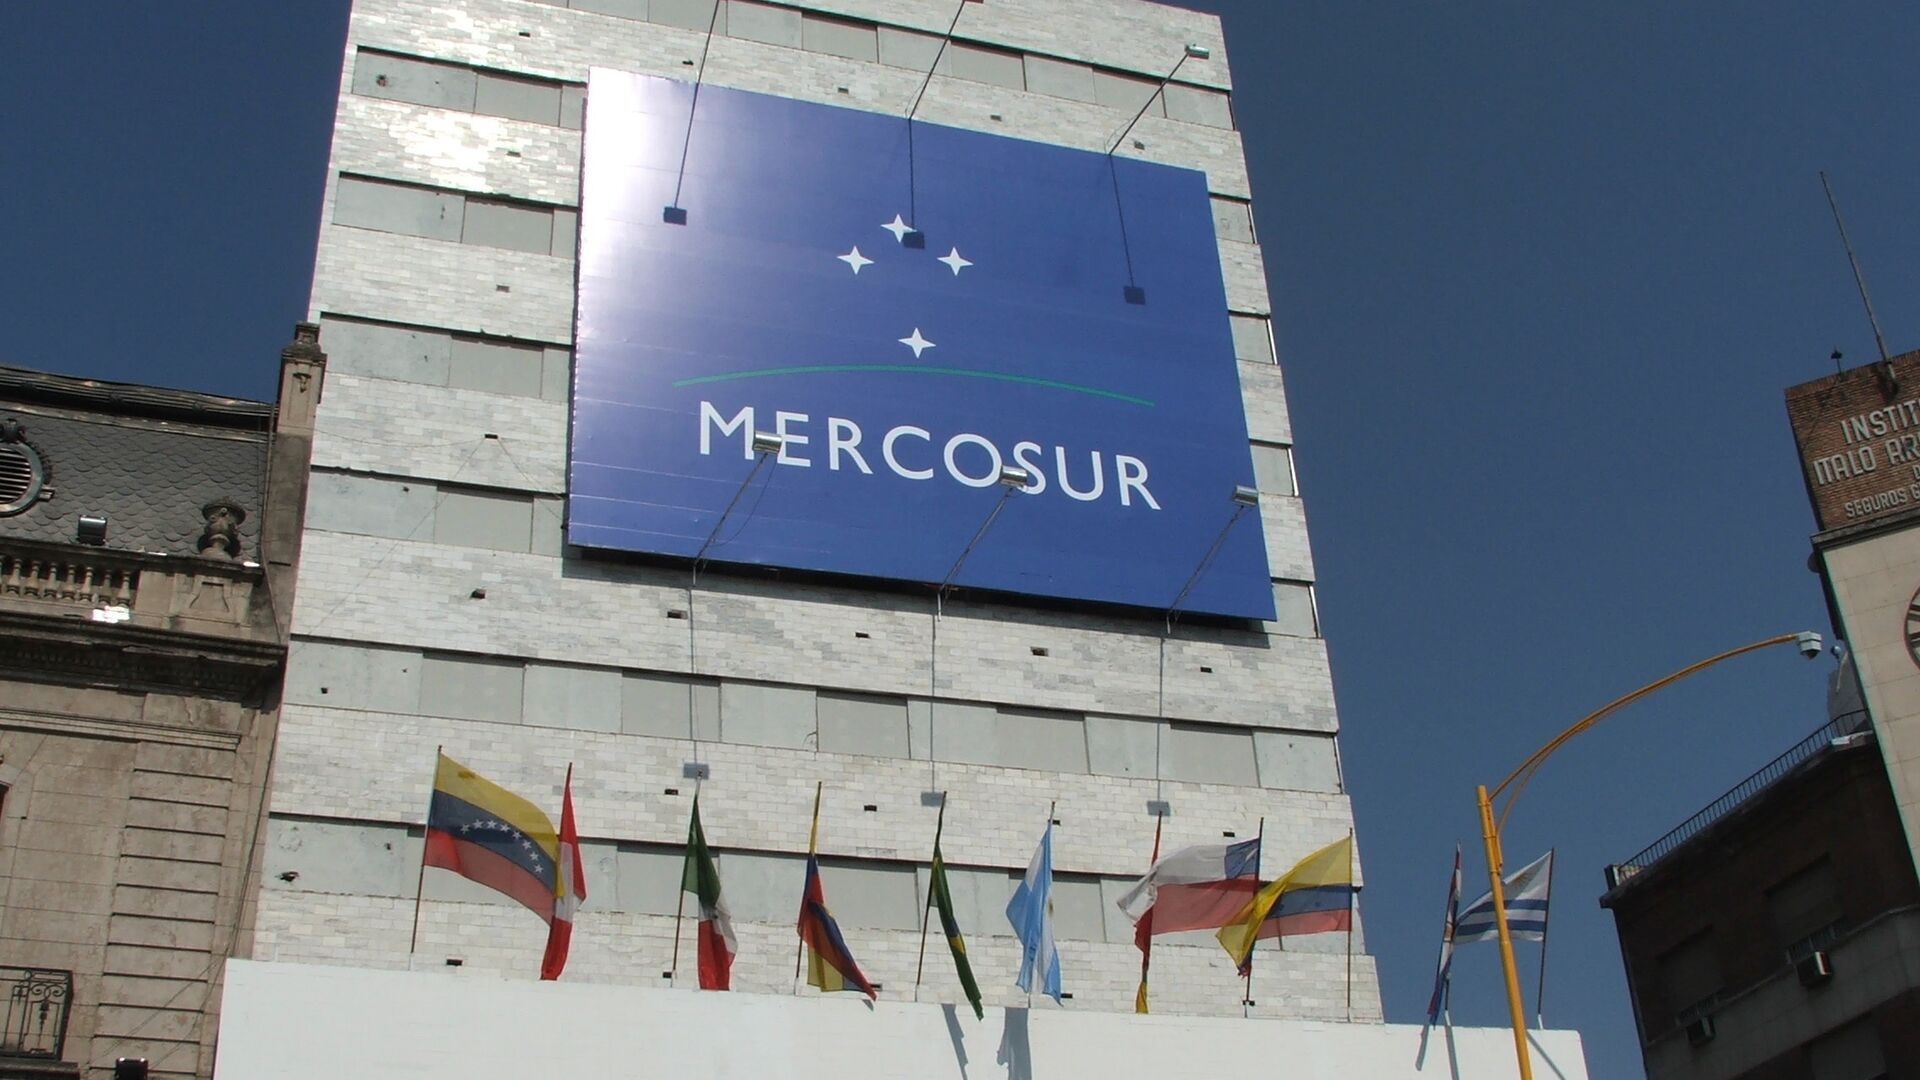 Sede del Mercosur - Sputnik Mundo, 1920, 27.05.2021